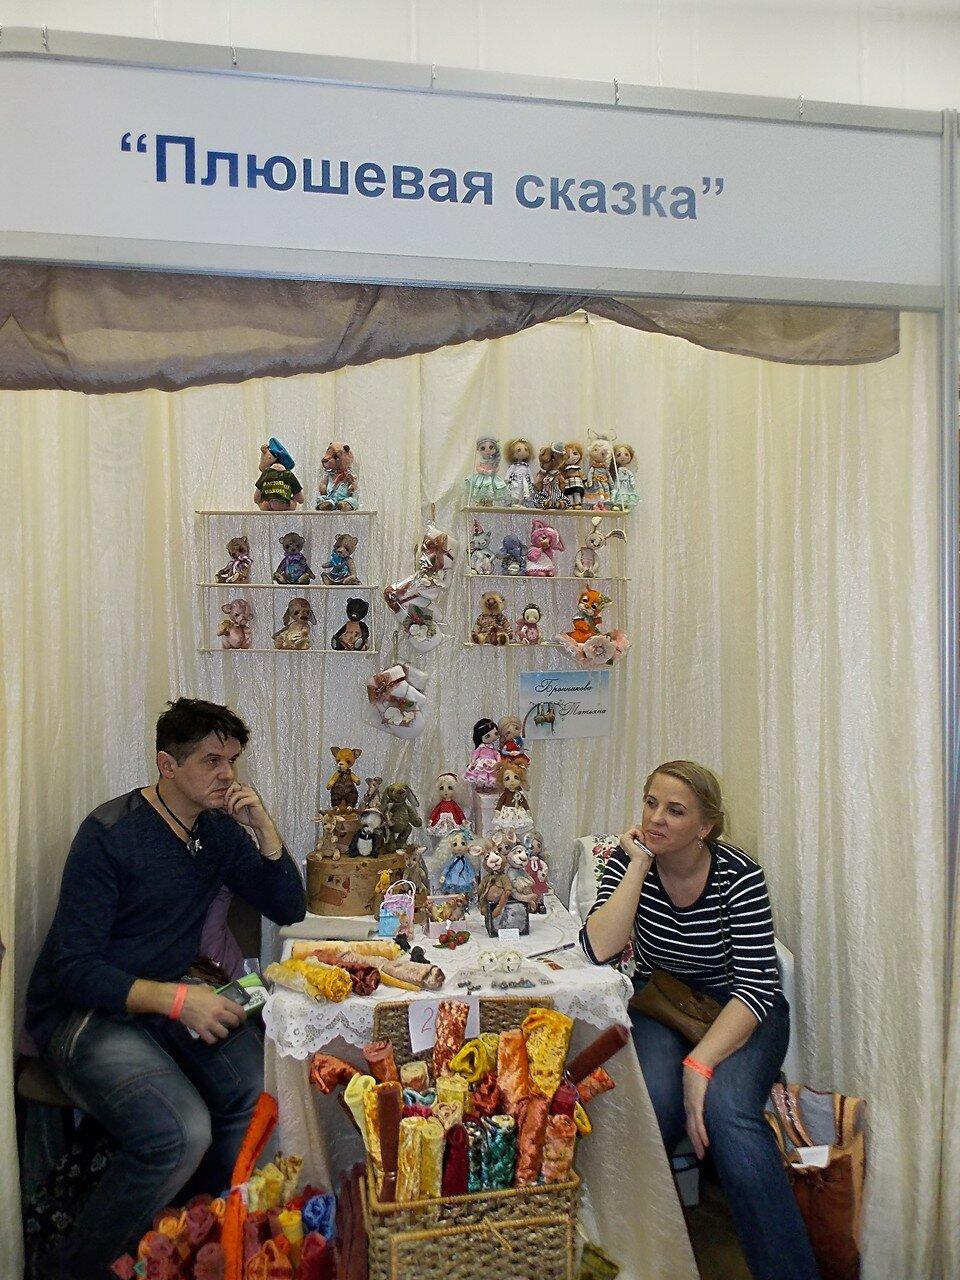 https://img-fotki.yandex.ru/get/15518/22326931.28/0_9f032_11130f86_XXXL.jpg